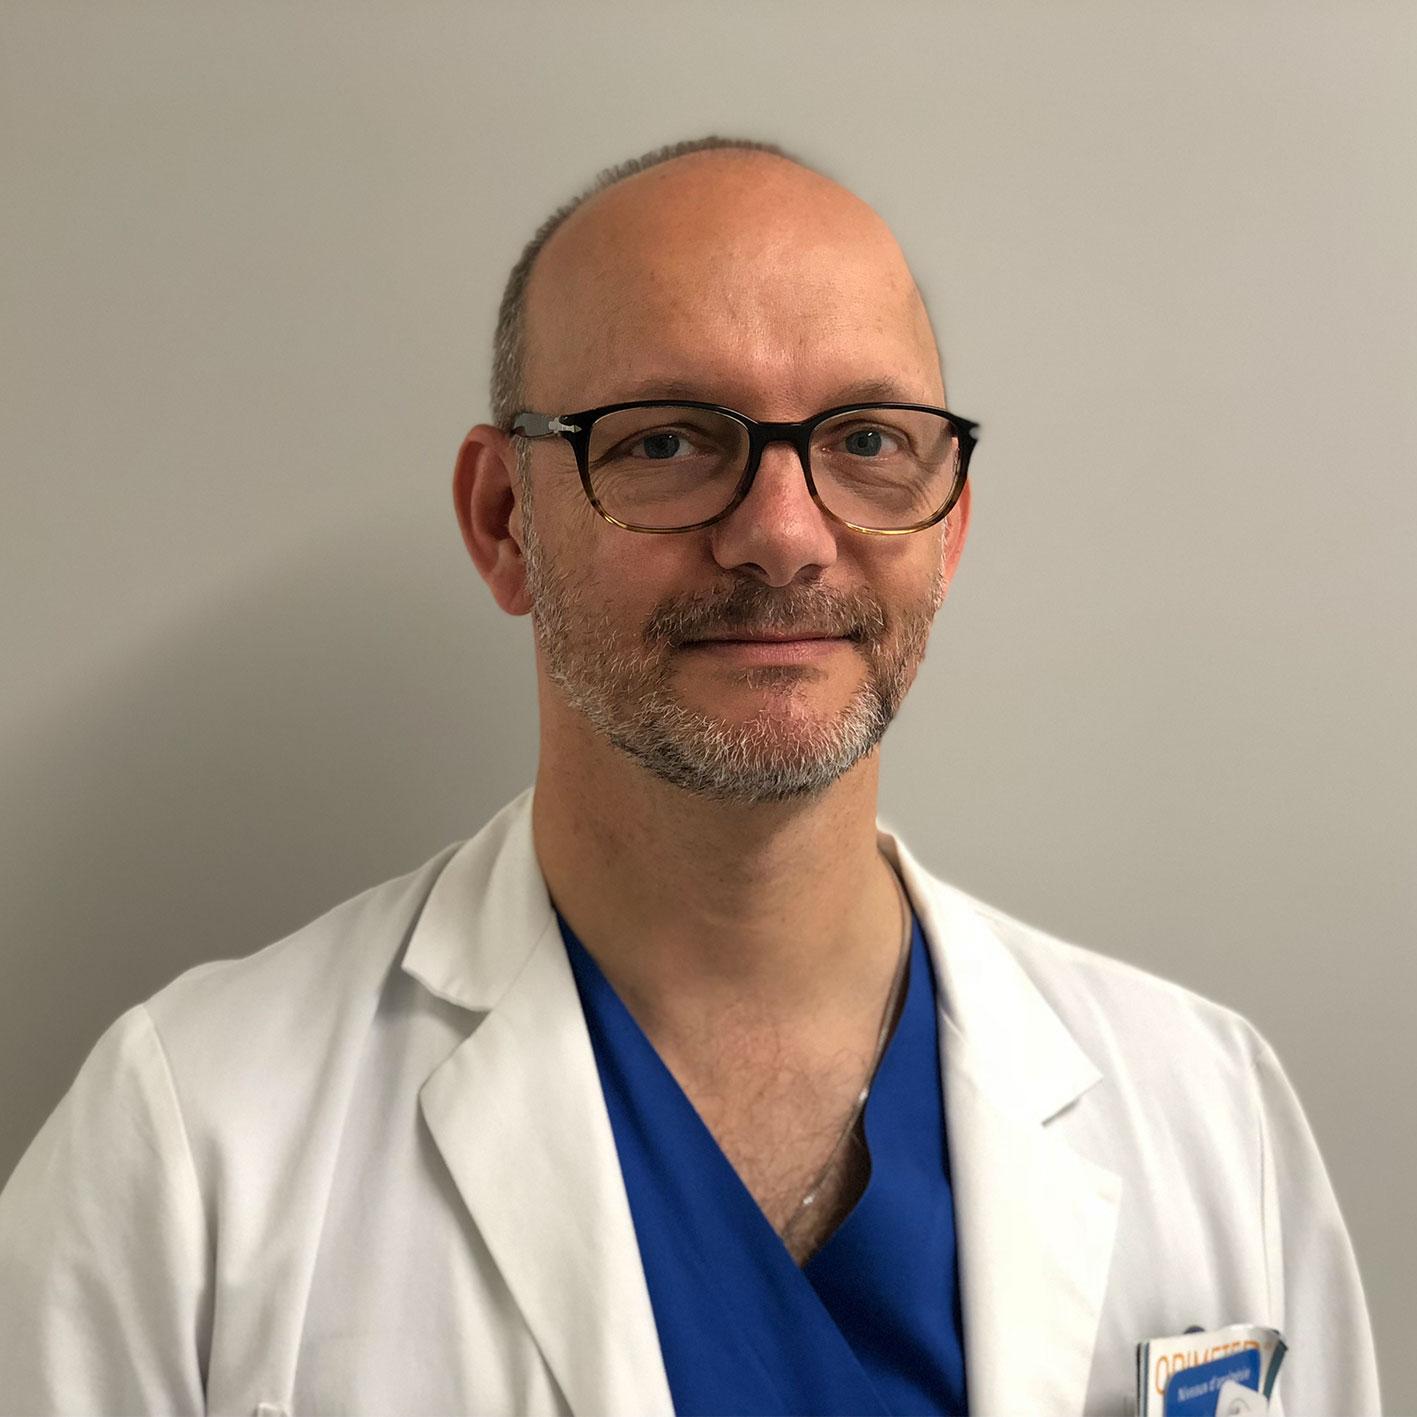 Dr Nicolas Mariotti